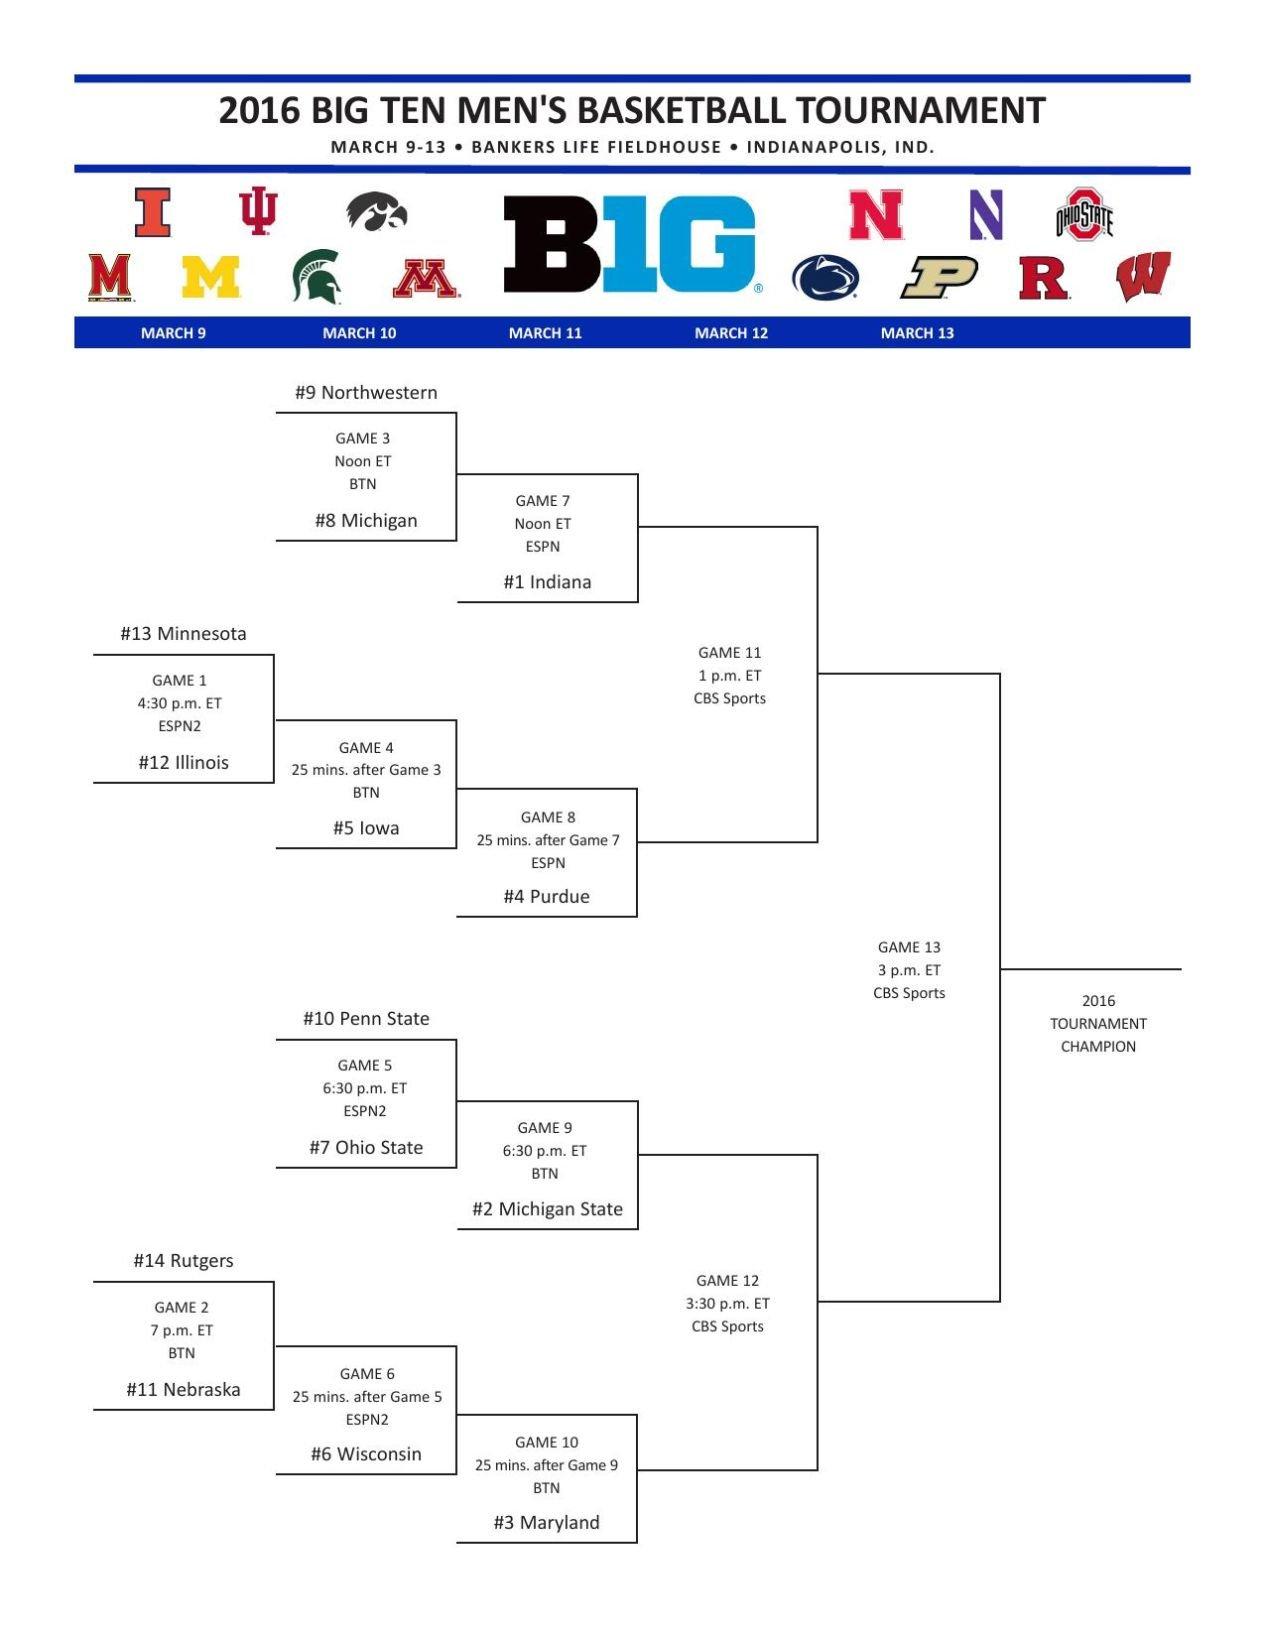 2016 Big Ten Men's Basketball Tournament - Wikipedia